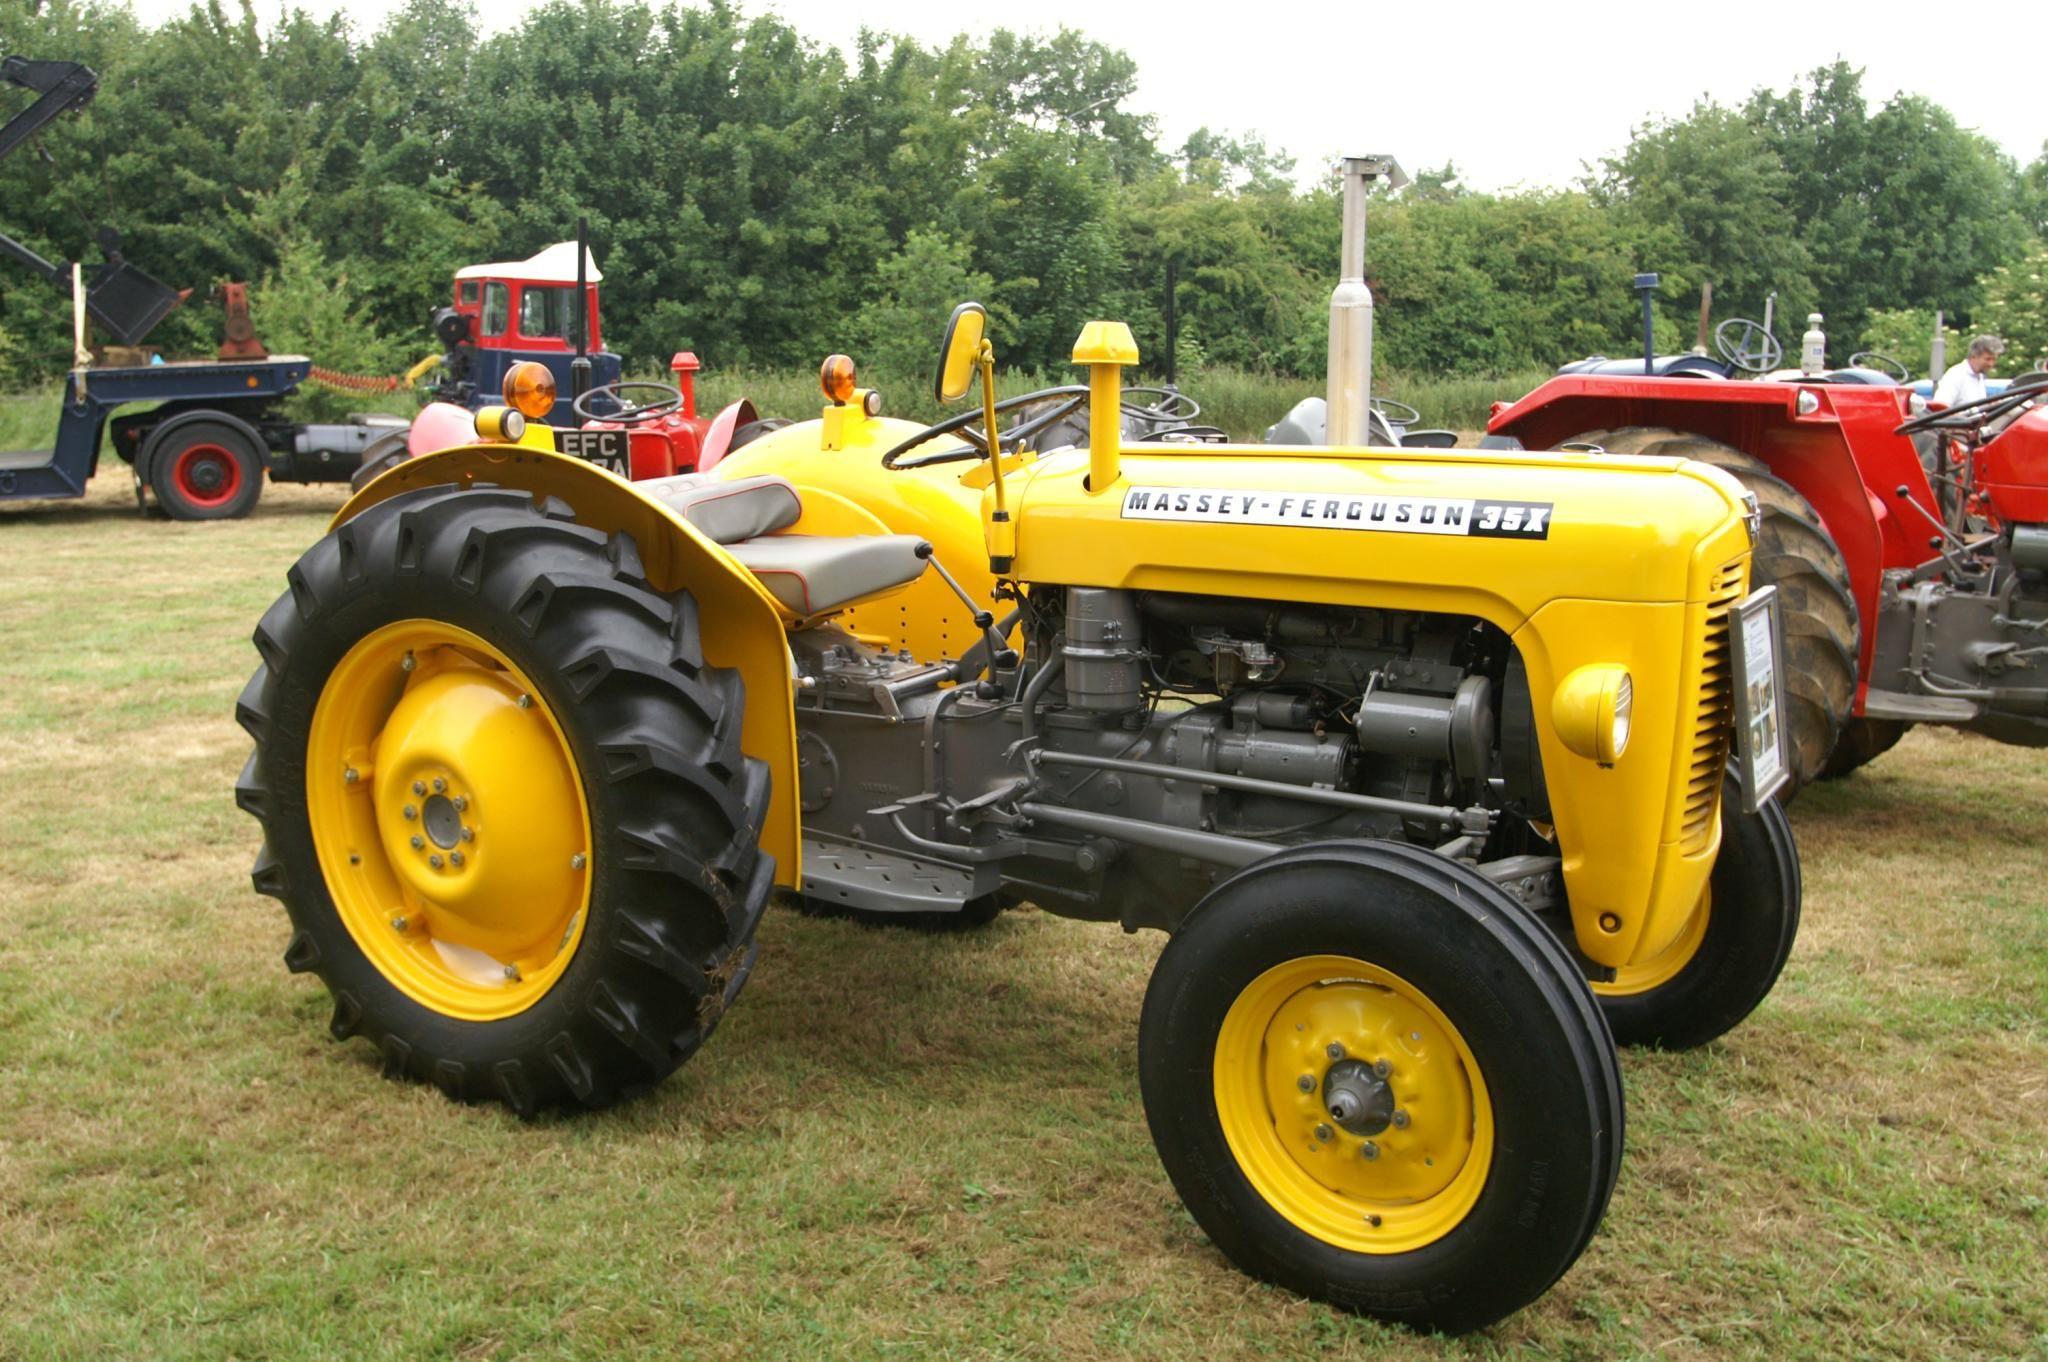 massey ferguson 35x tractor mania pinterest tractor. Black Bedroom Furniture Sets. Home Design Ideas